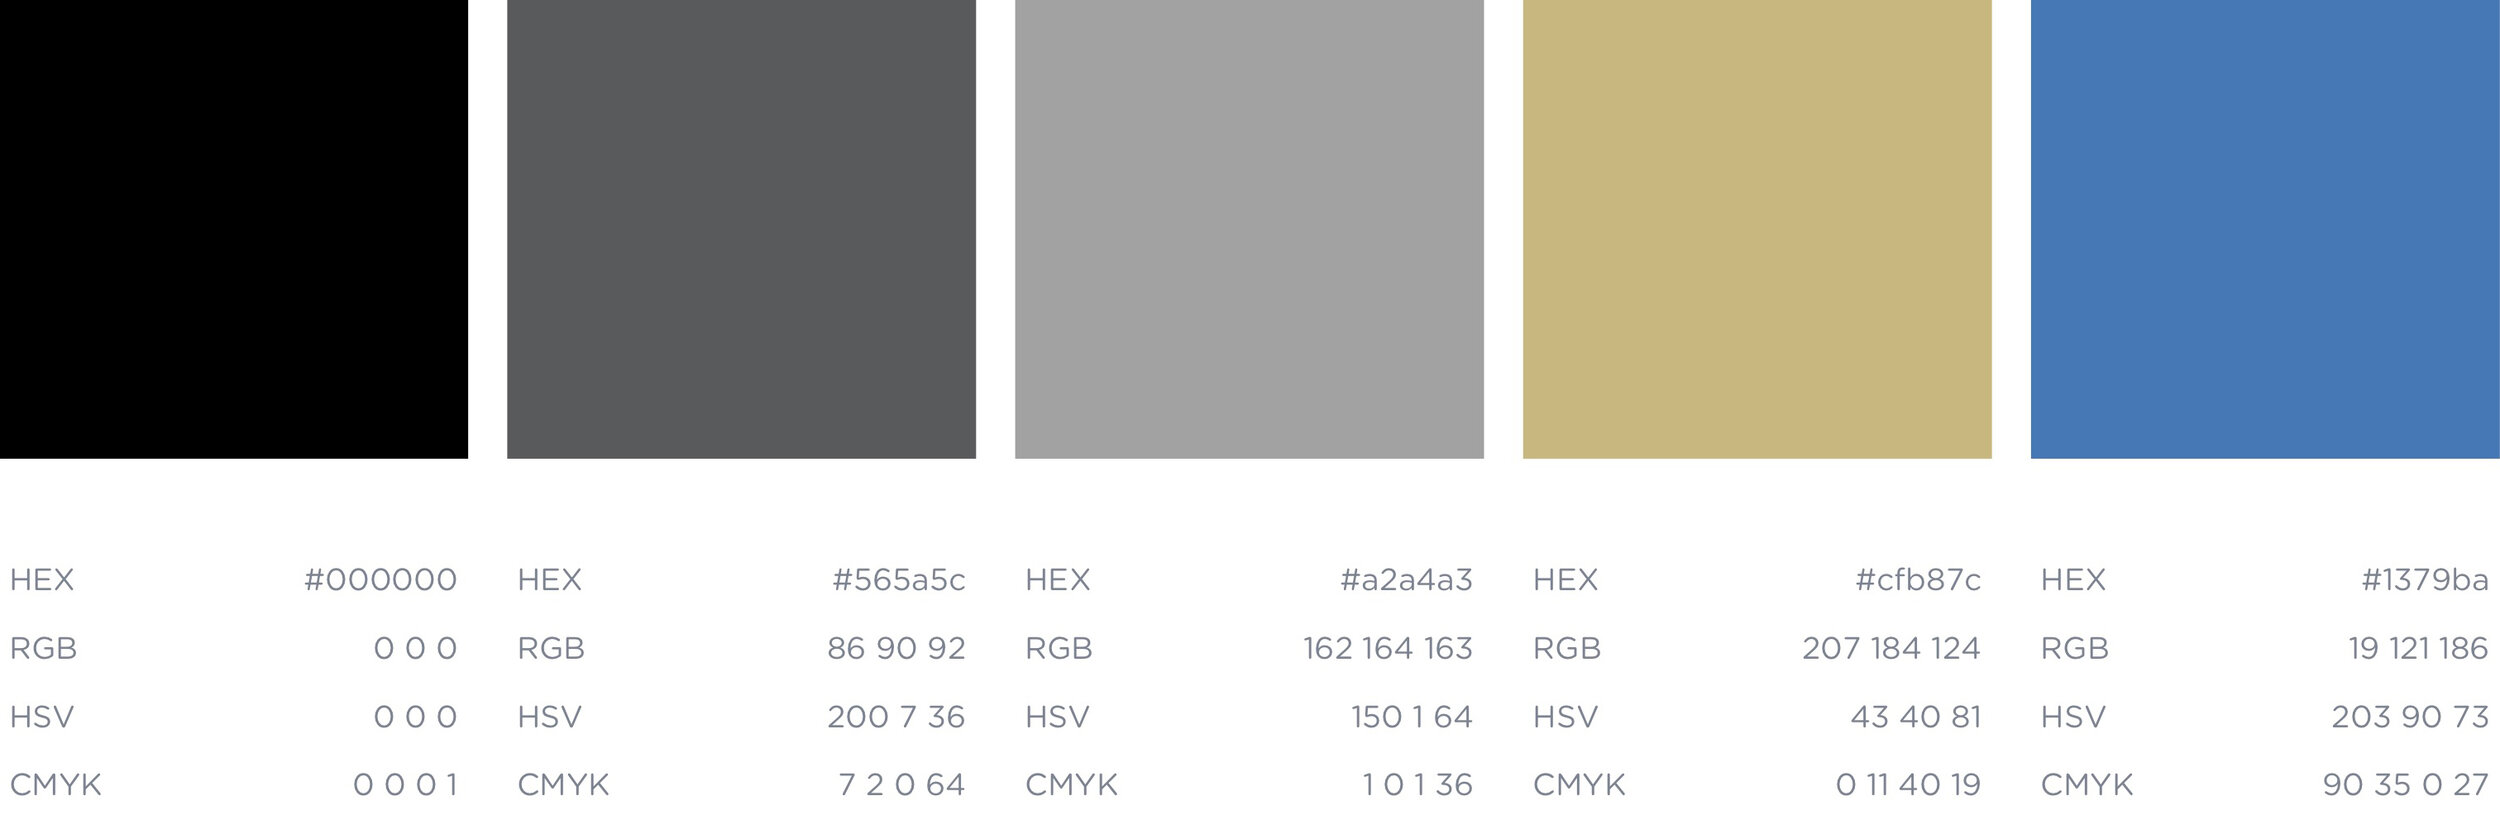 CU-Boulder brand colors.jpg